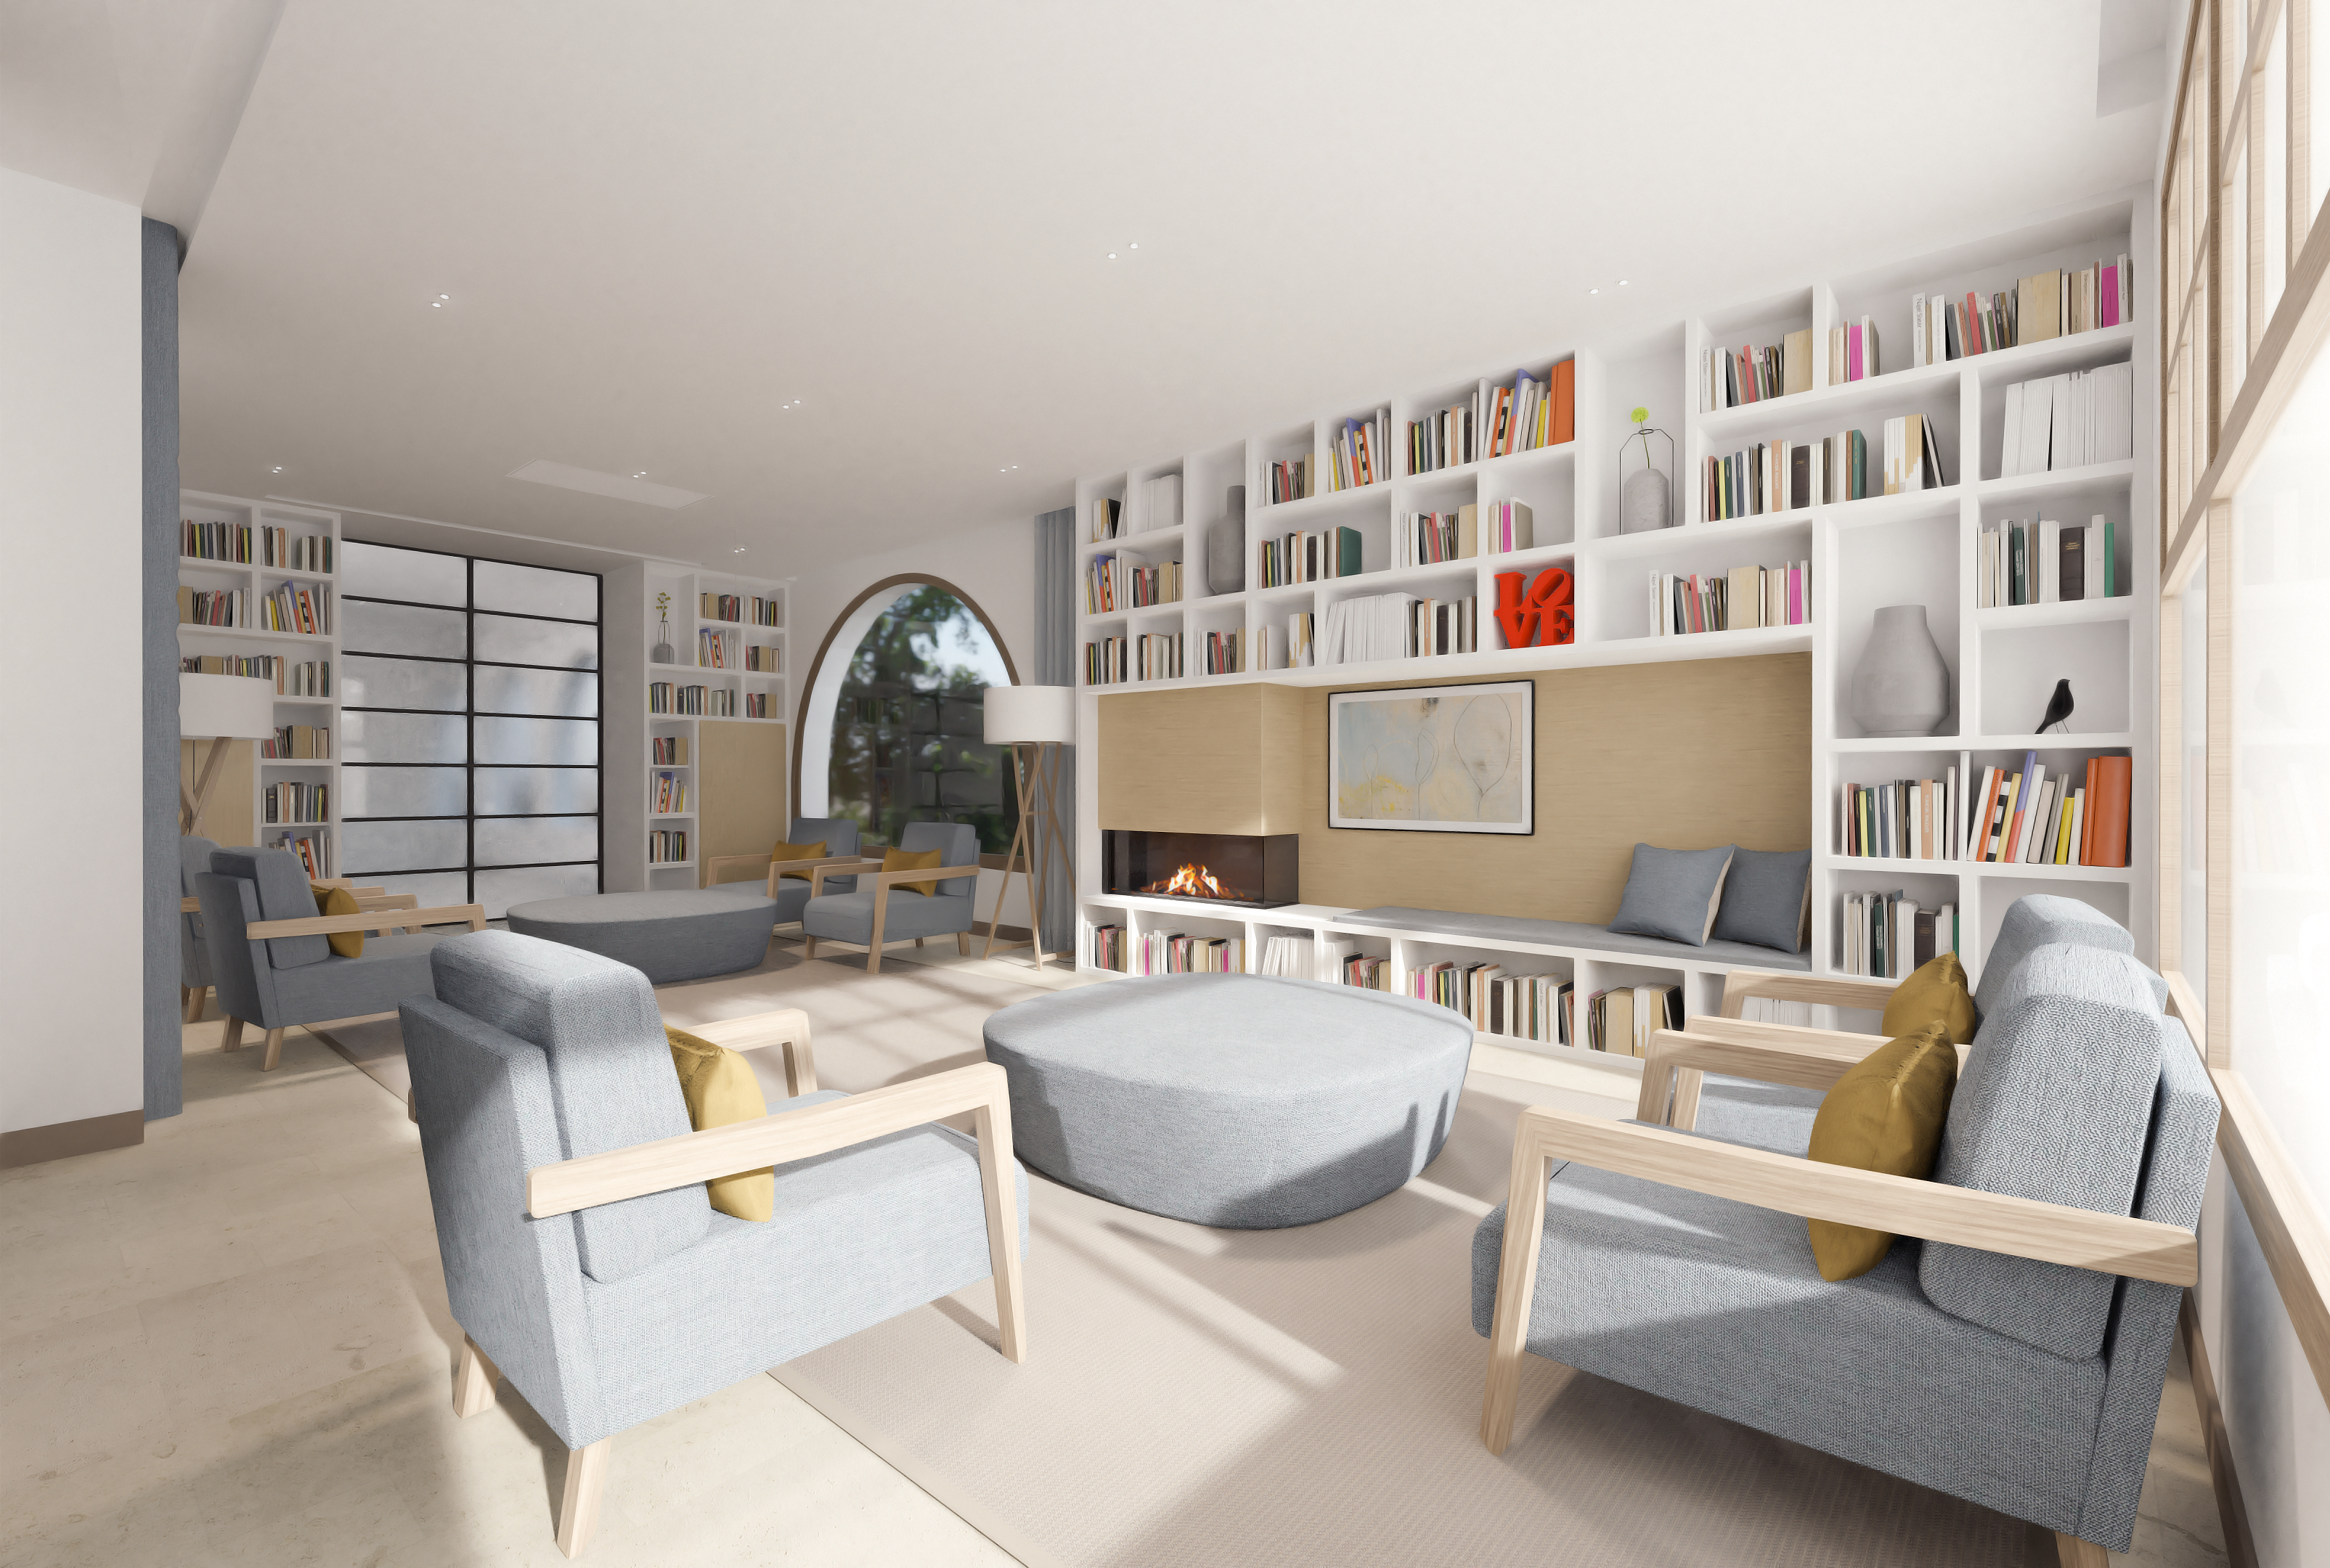 rardo-architects-new-hotel-project-sitges-vilanova-barcleona-garraf-coast-11